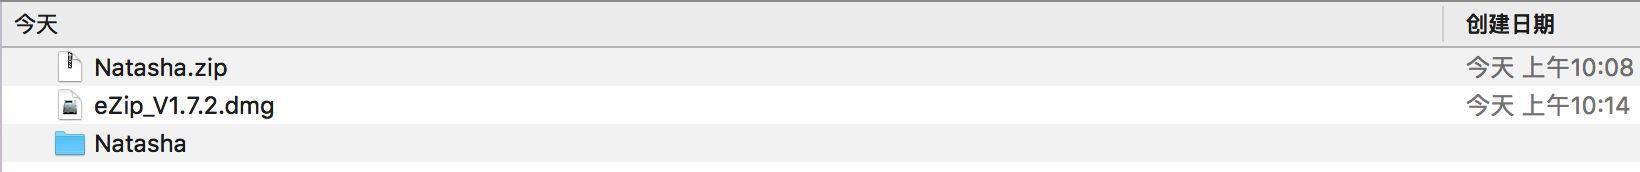 Chrome浏览器安装CRX插件时出现